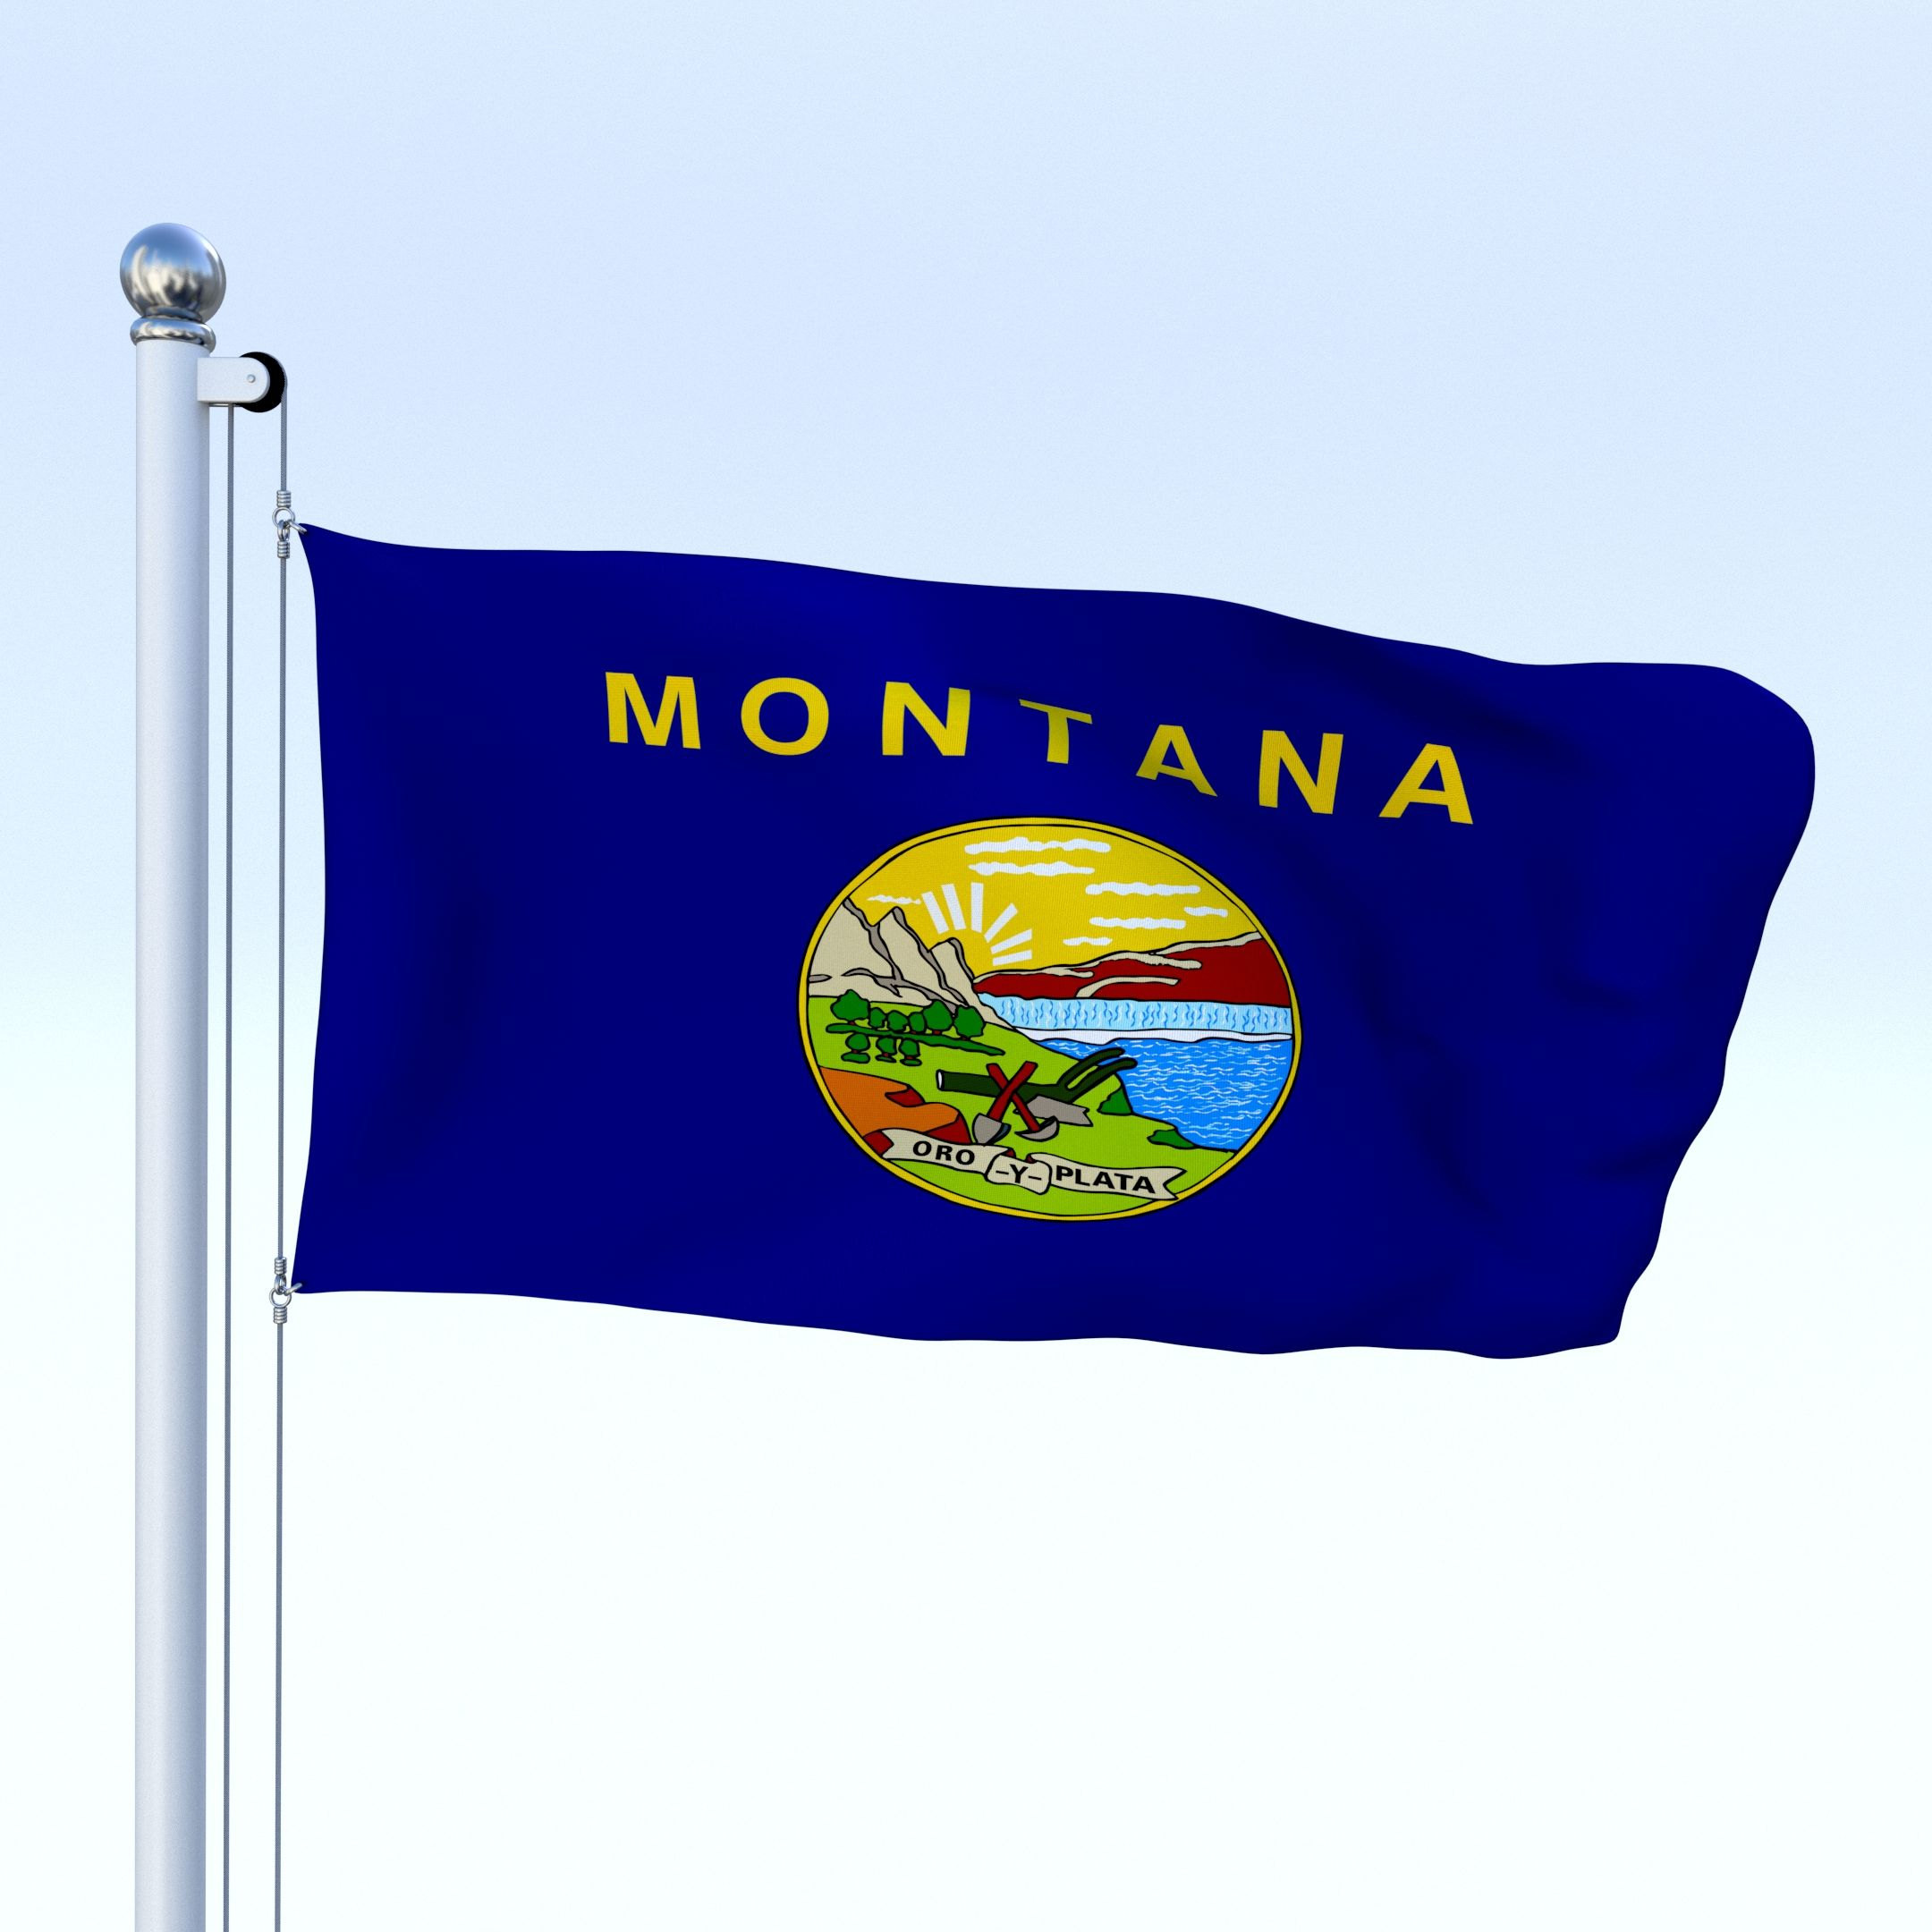 Animated Montana Flag Animated Montana Flag Flag Animation Montana